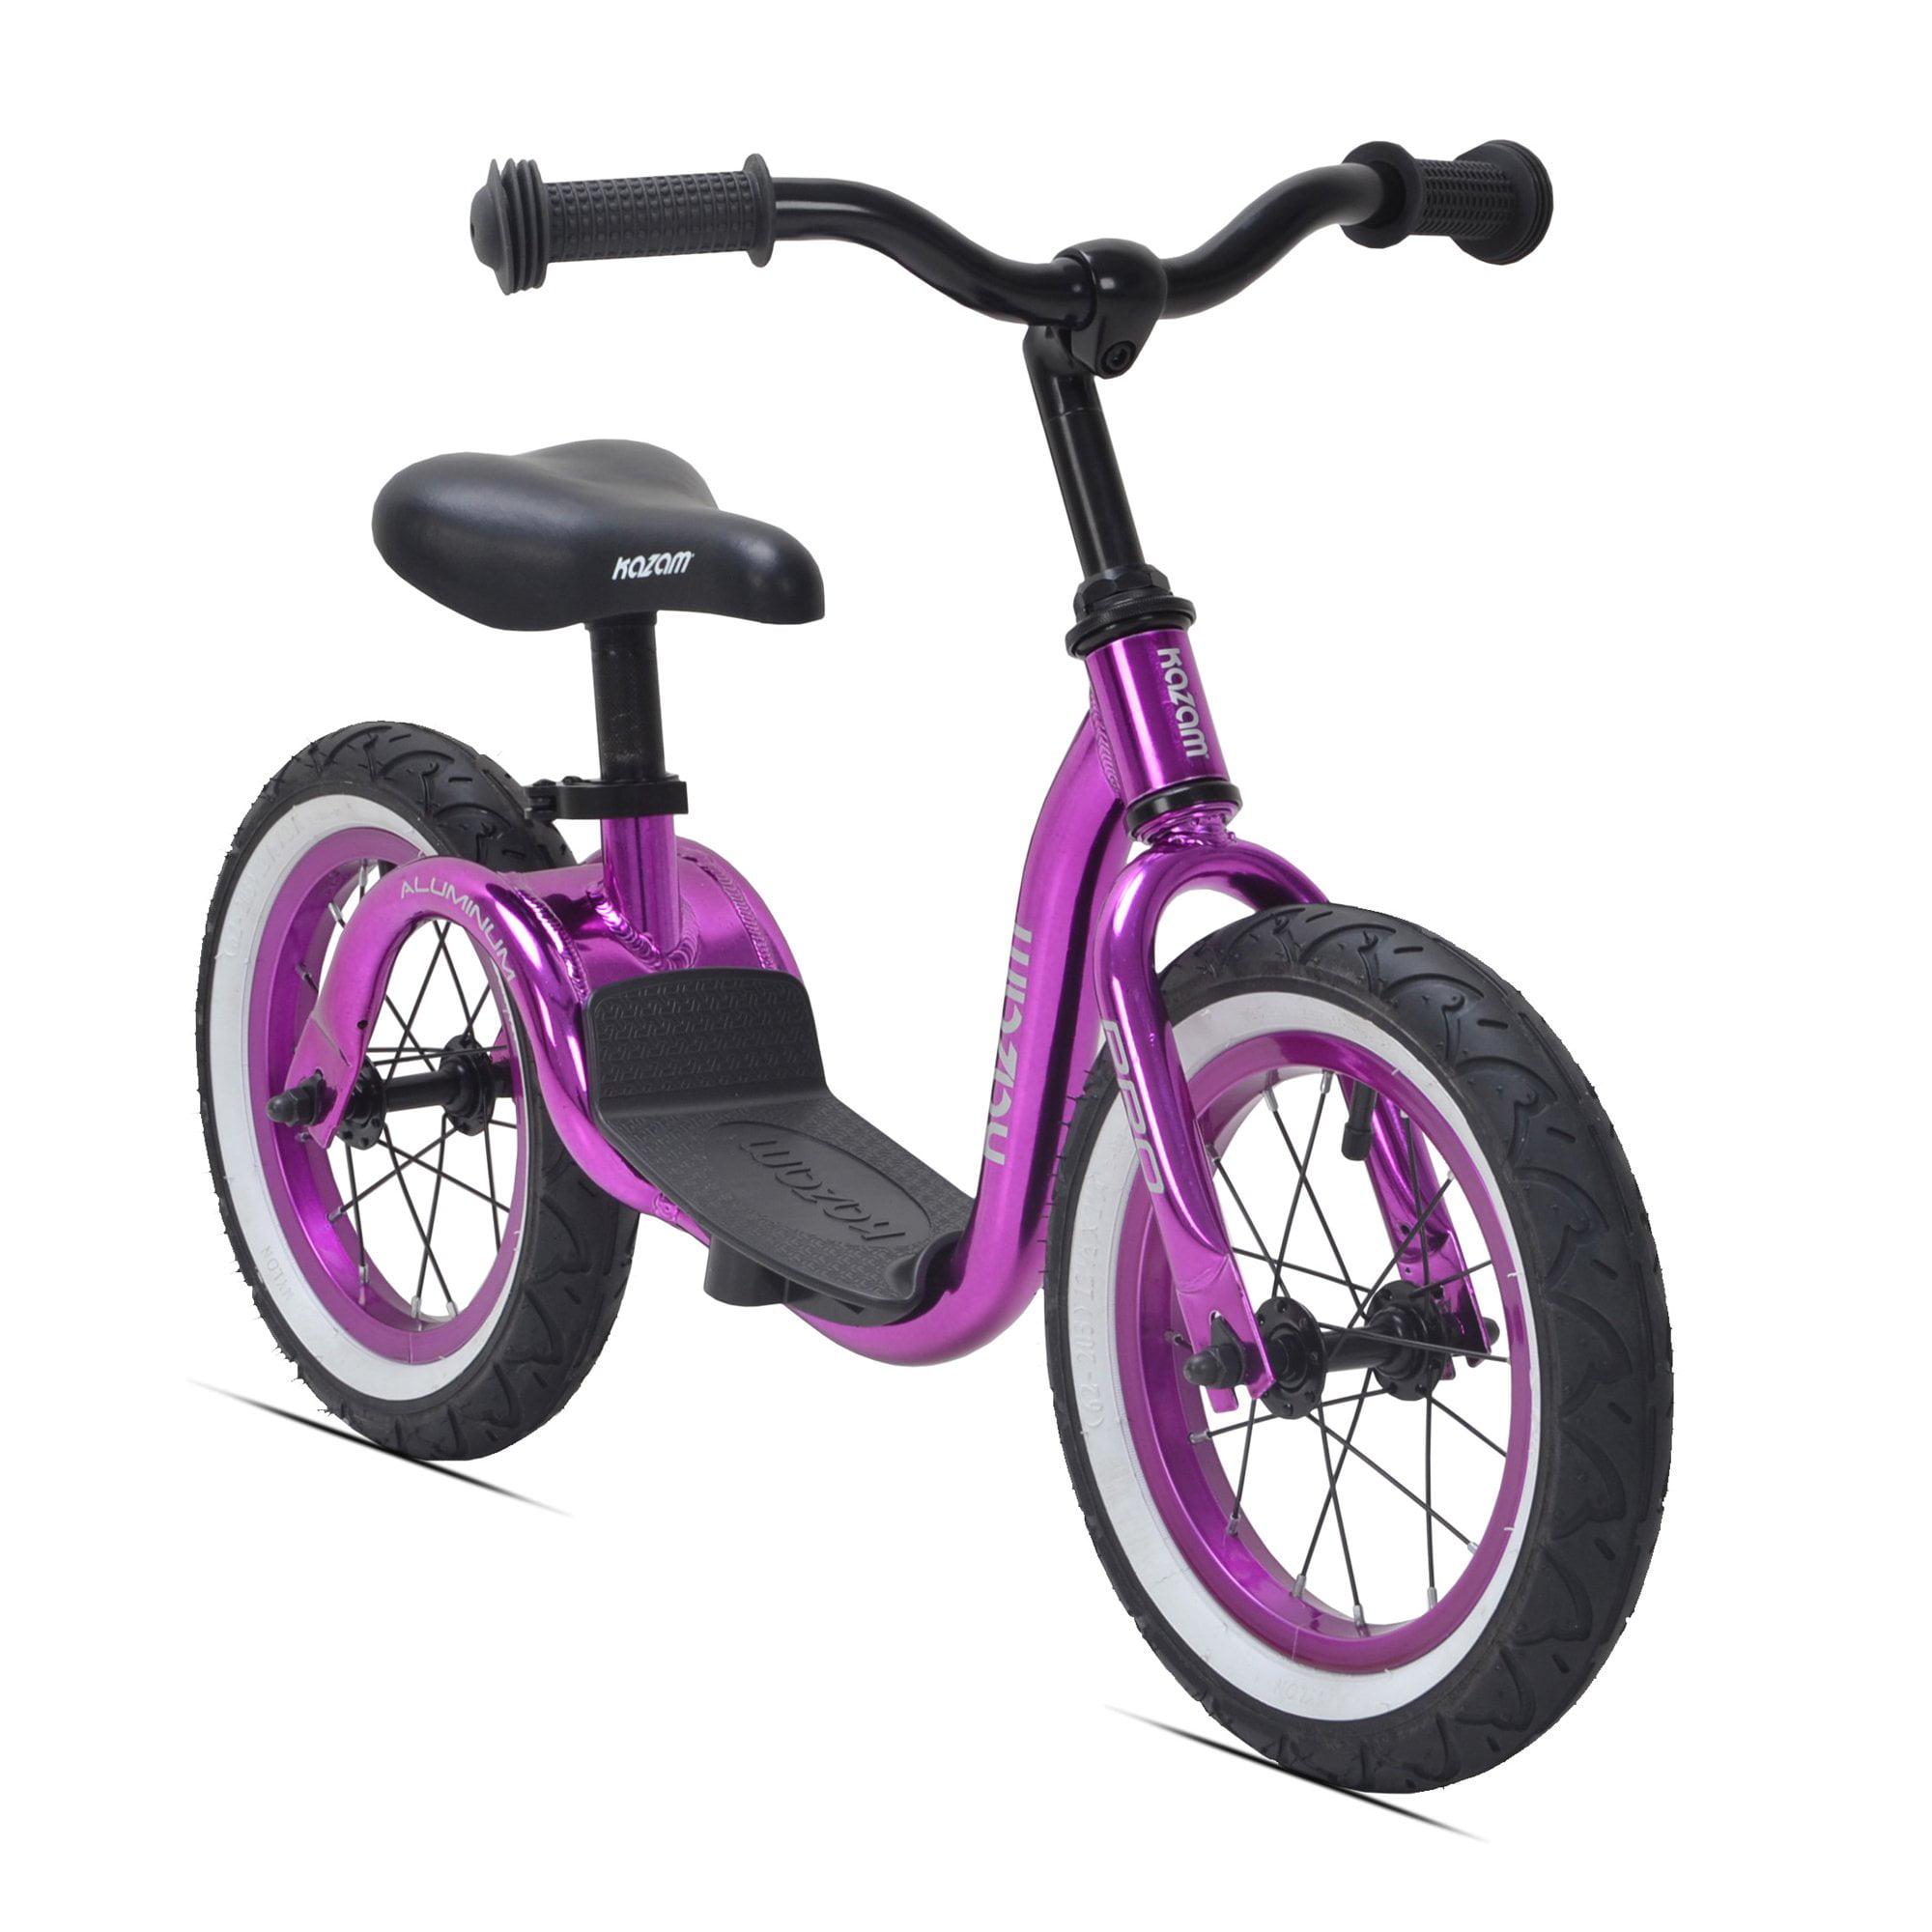 KaZAM Bikes Purple Pro Aluminum Kids No Pedal Learning Adjustable Balance Bike